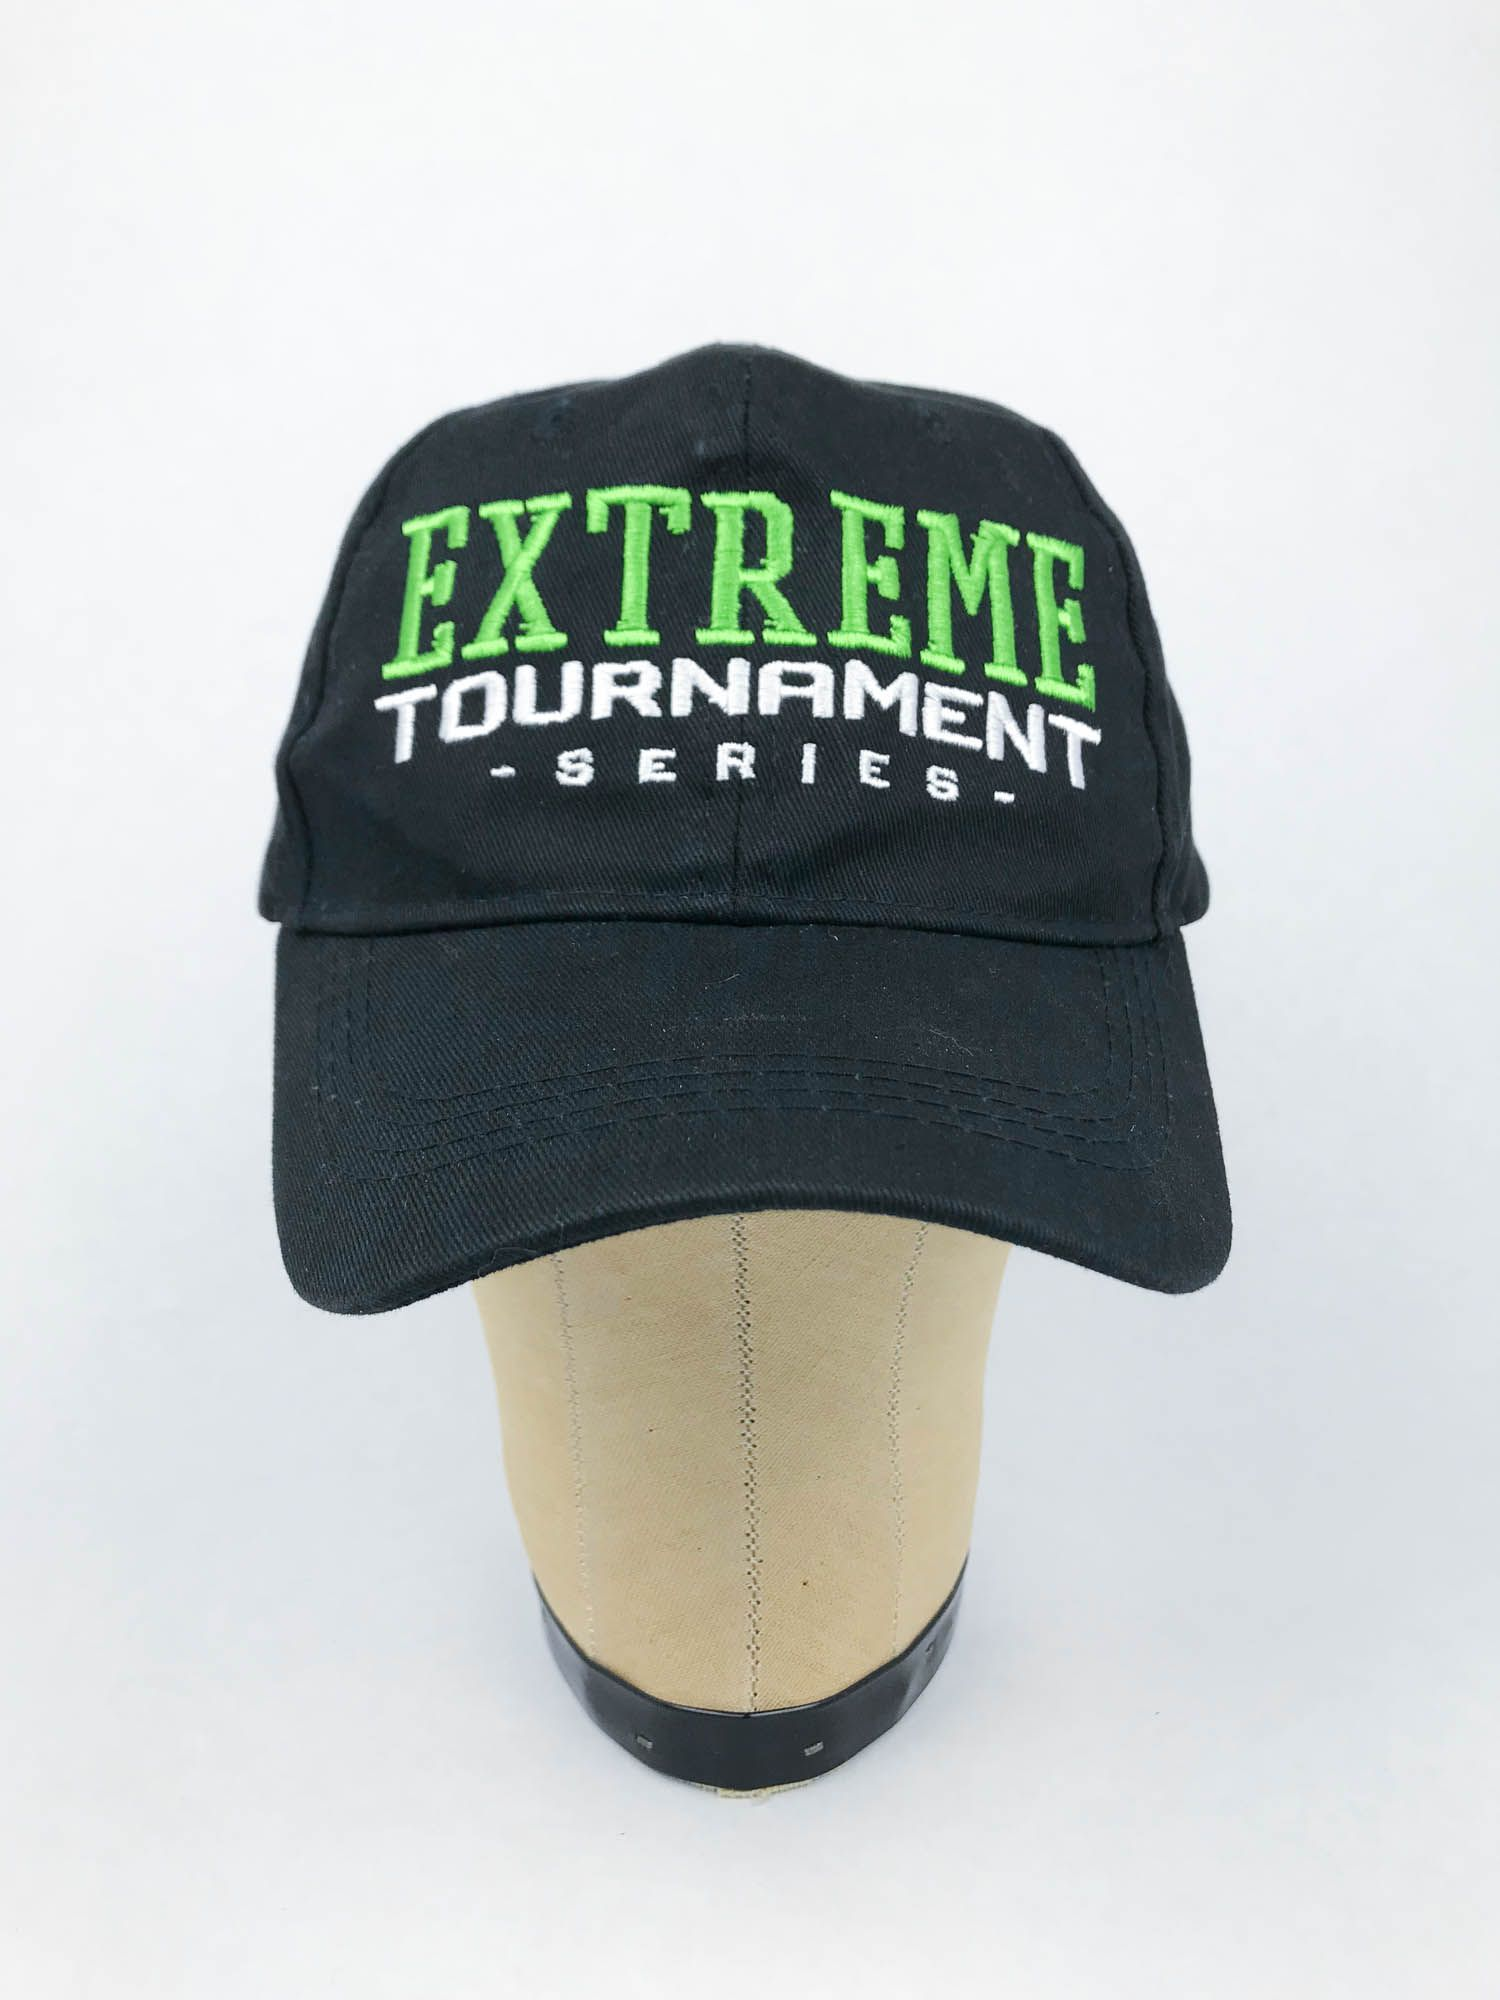 sports shoes 63537 1c1f6 ... get dallas stars extreme tournament series baseball hat nhl on blamm dallas  stars dallas stars hockey